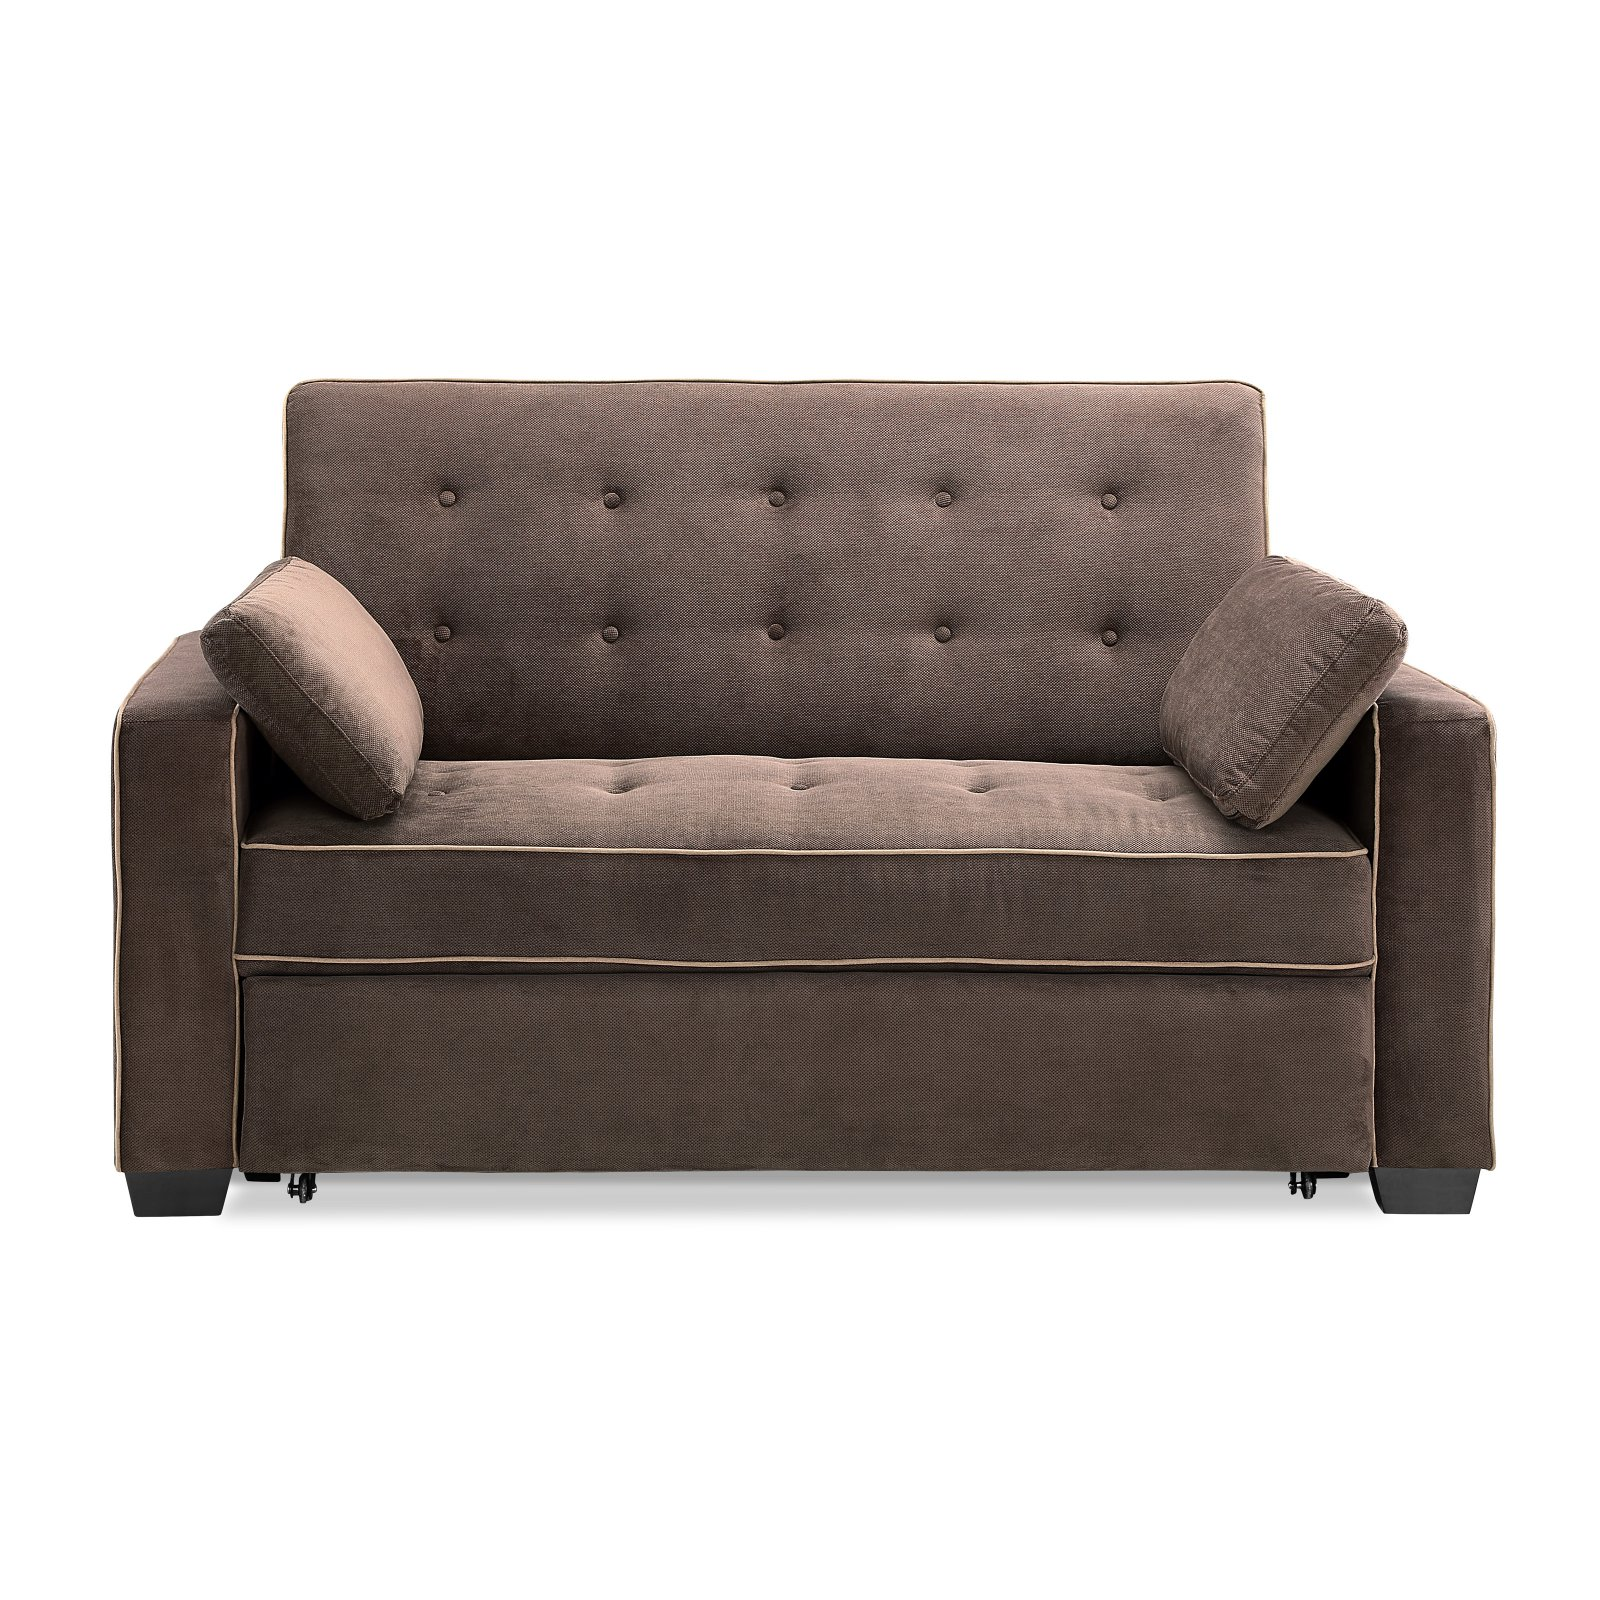 Serta Alyssa Convertible Sofa